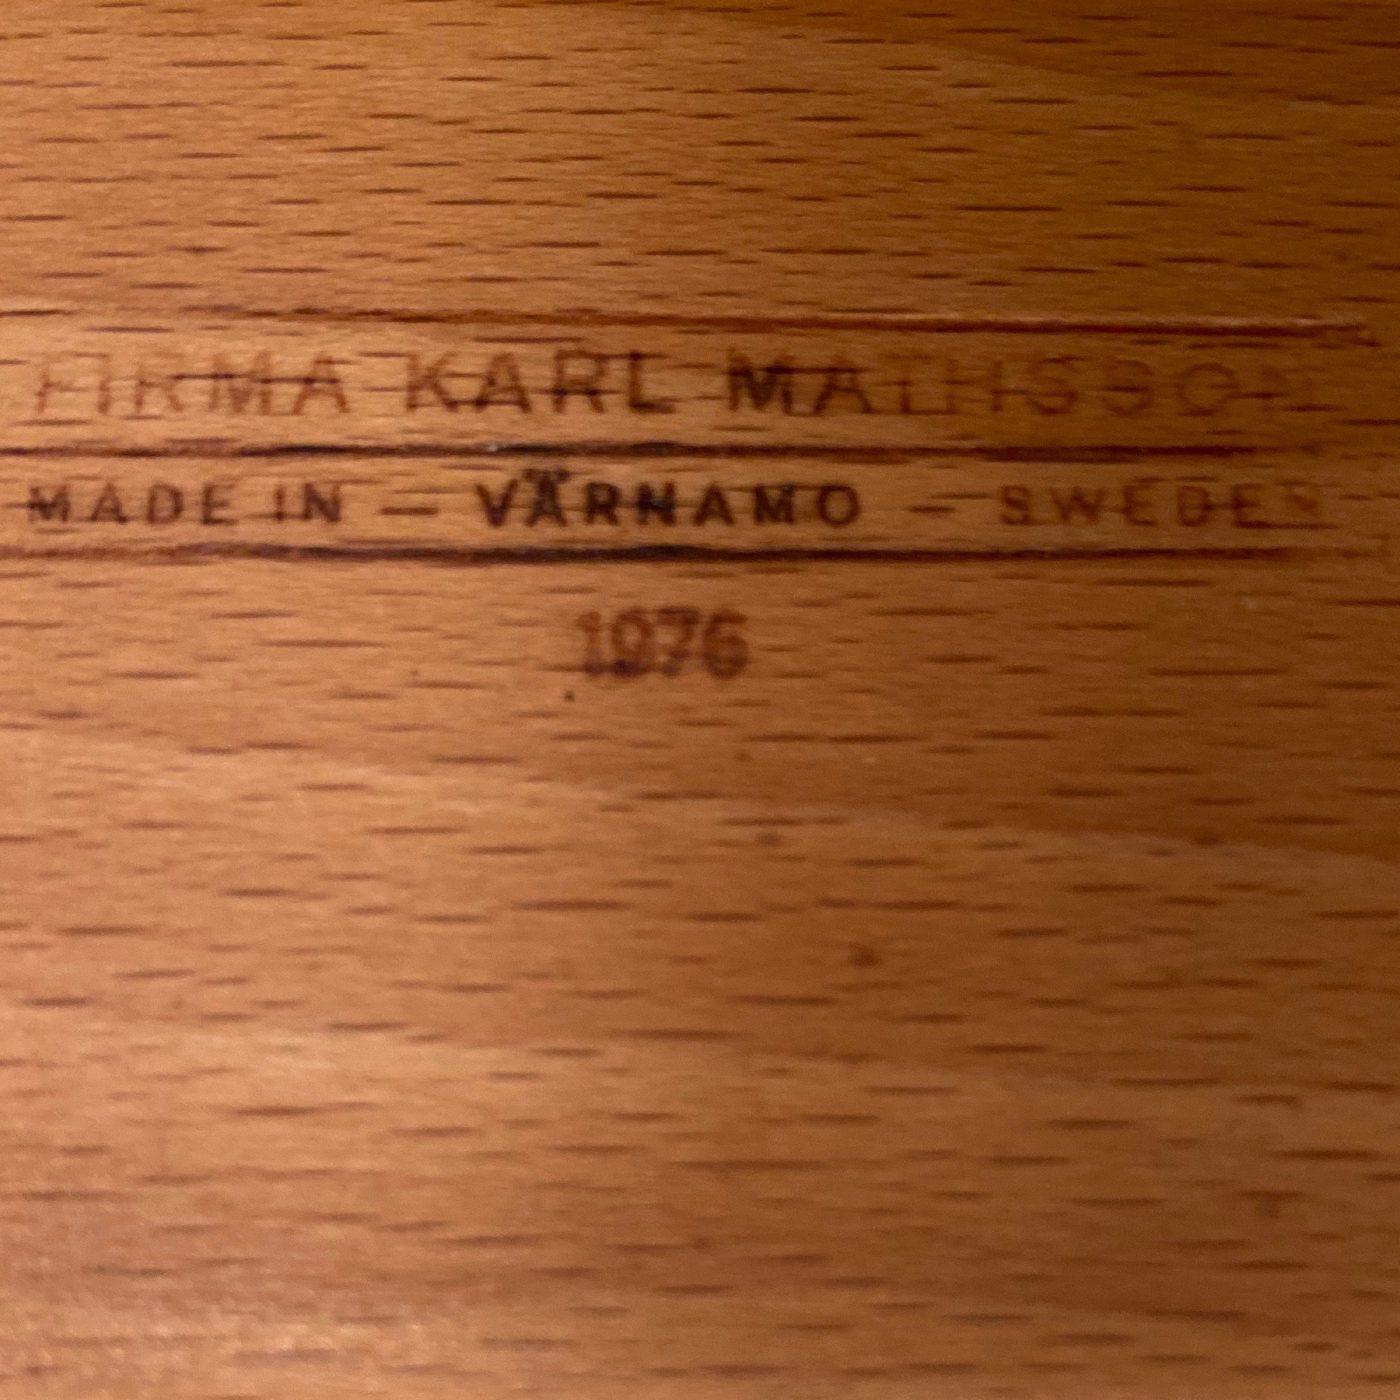 vintage-lounge-chair0010